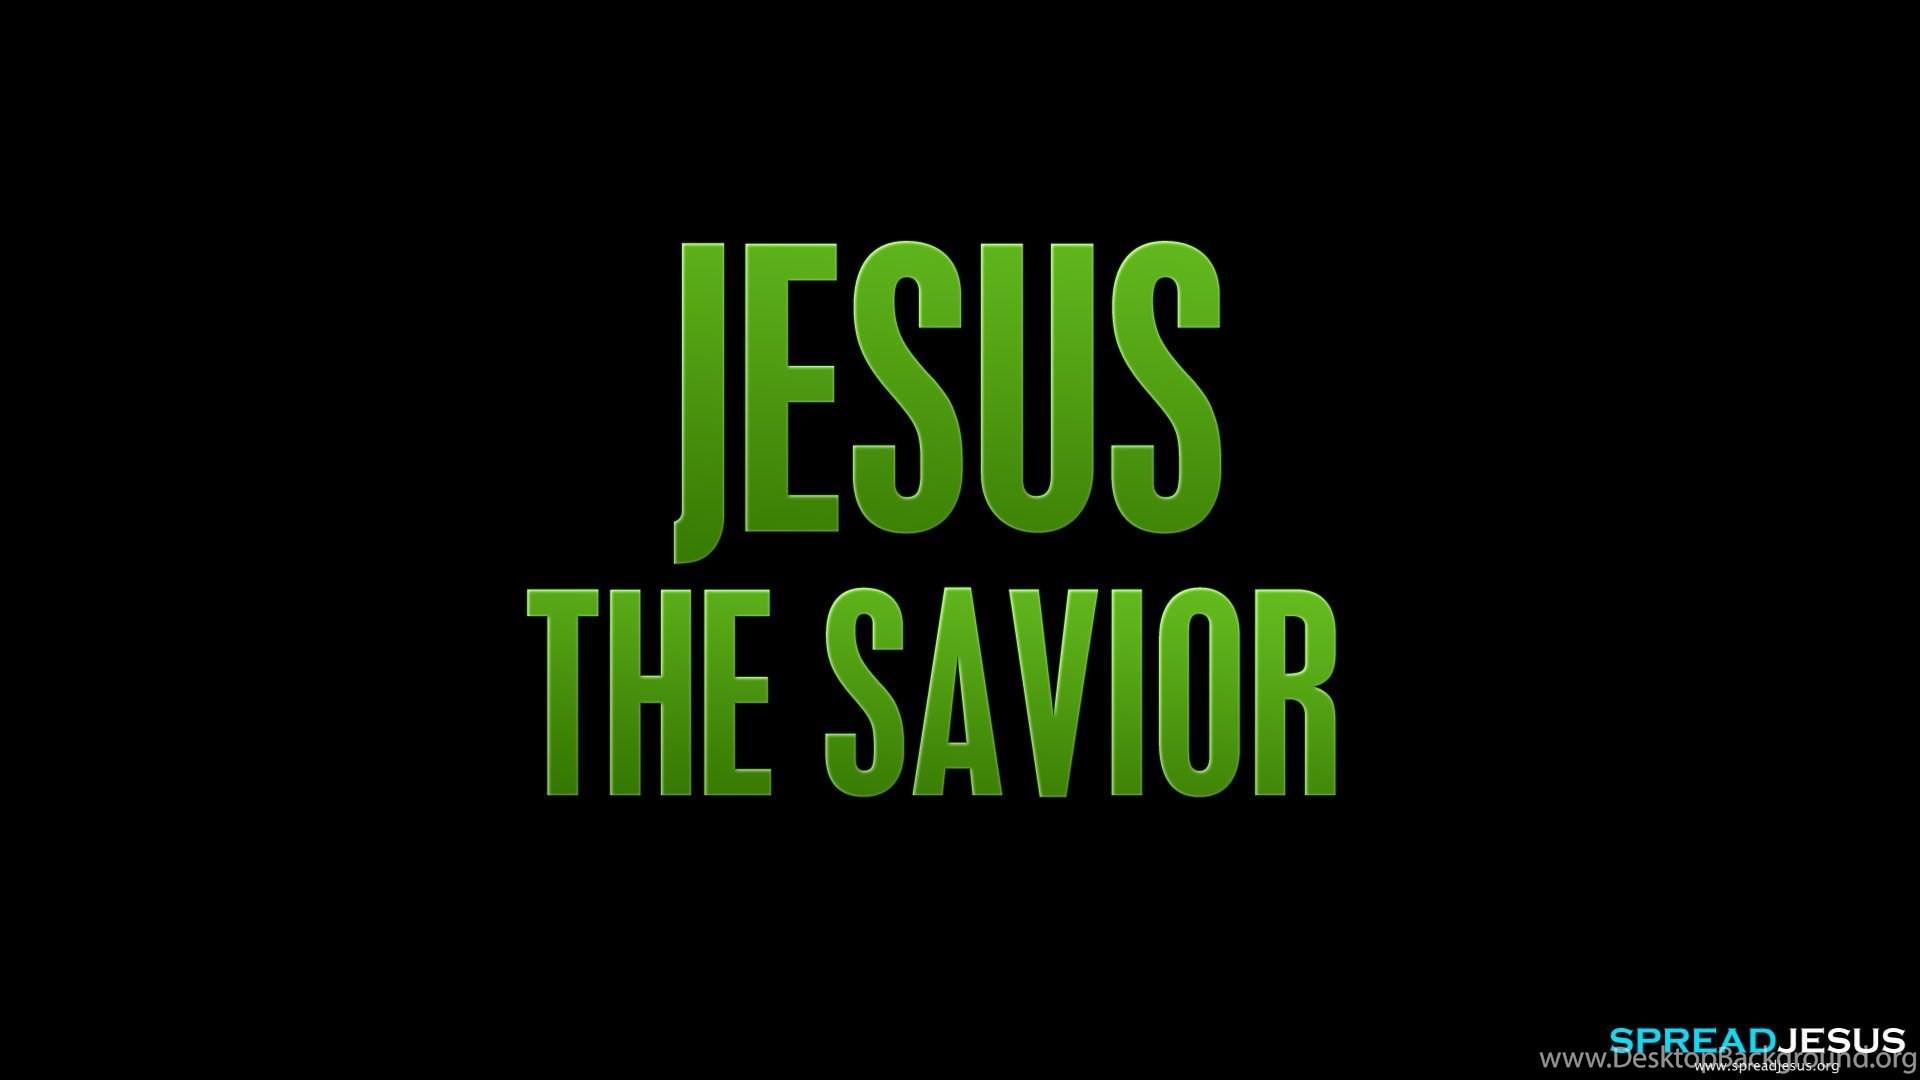 Jesus Christ HD Wallpapers Free Download Jesus The Savior:Jesus ...